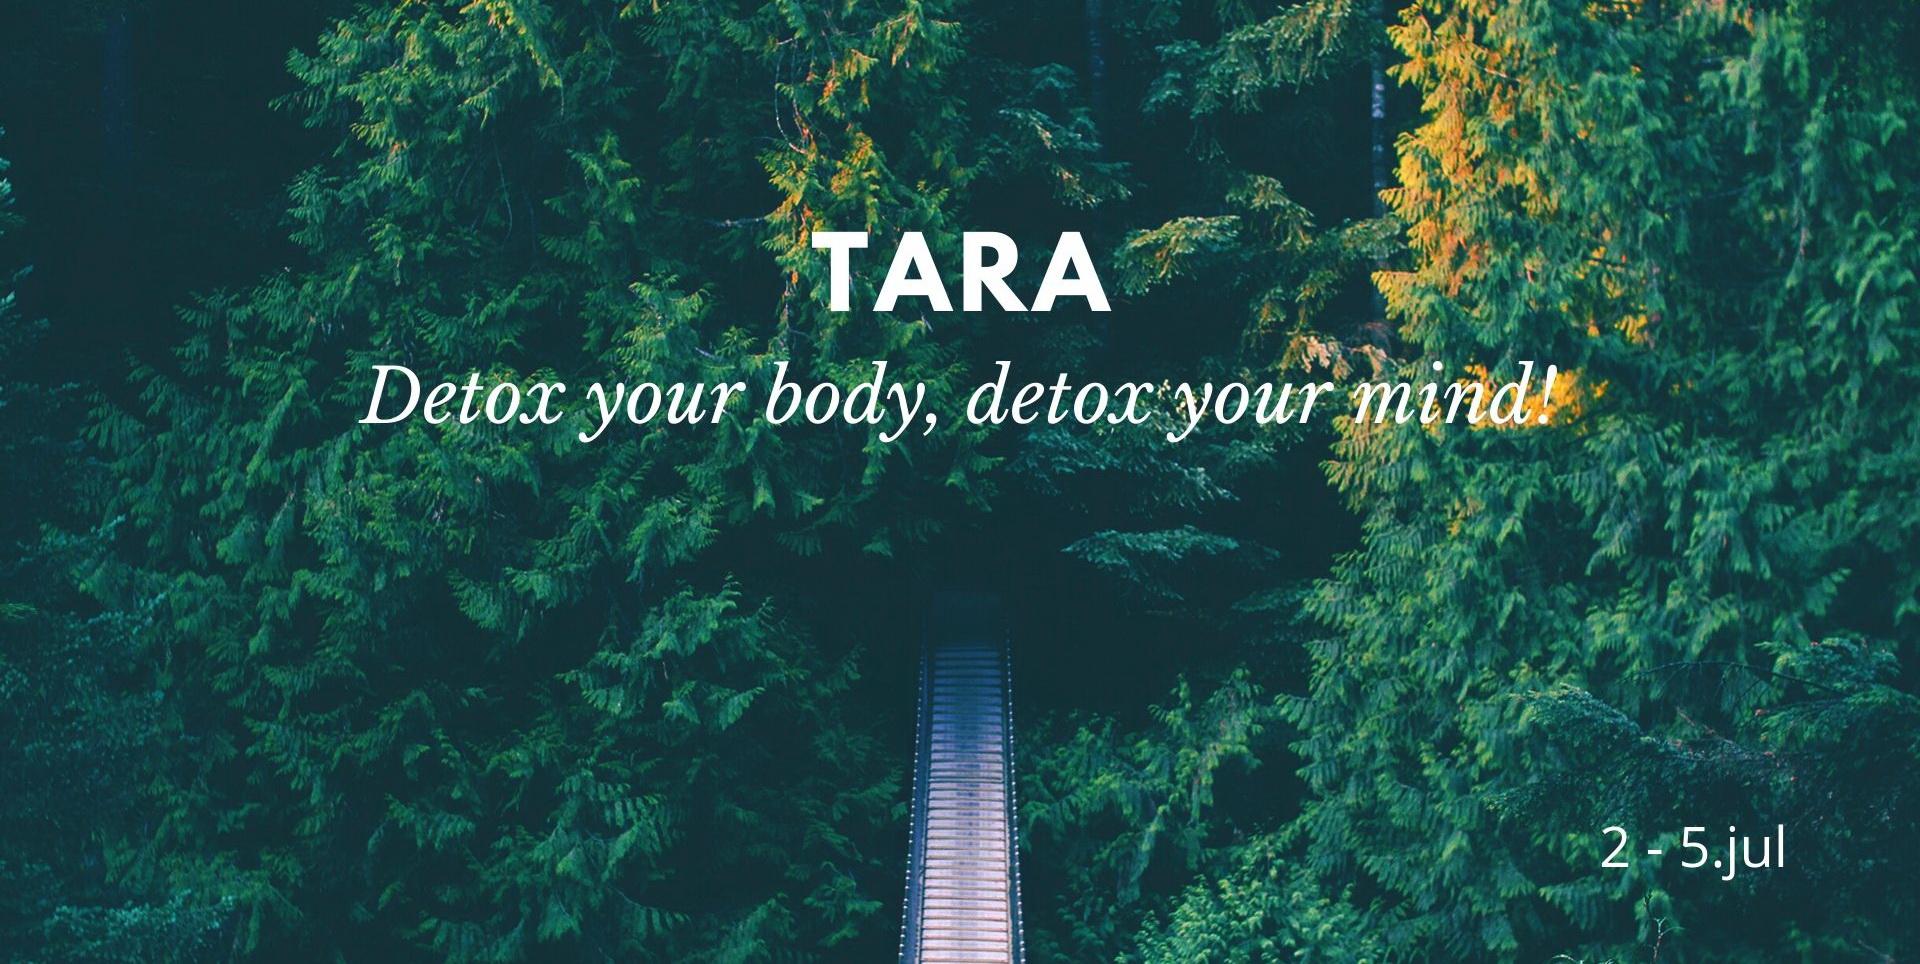 Detox your body, detox your mind - Tara, 2020.